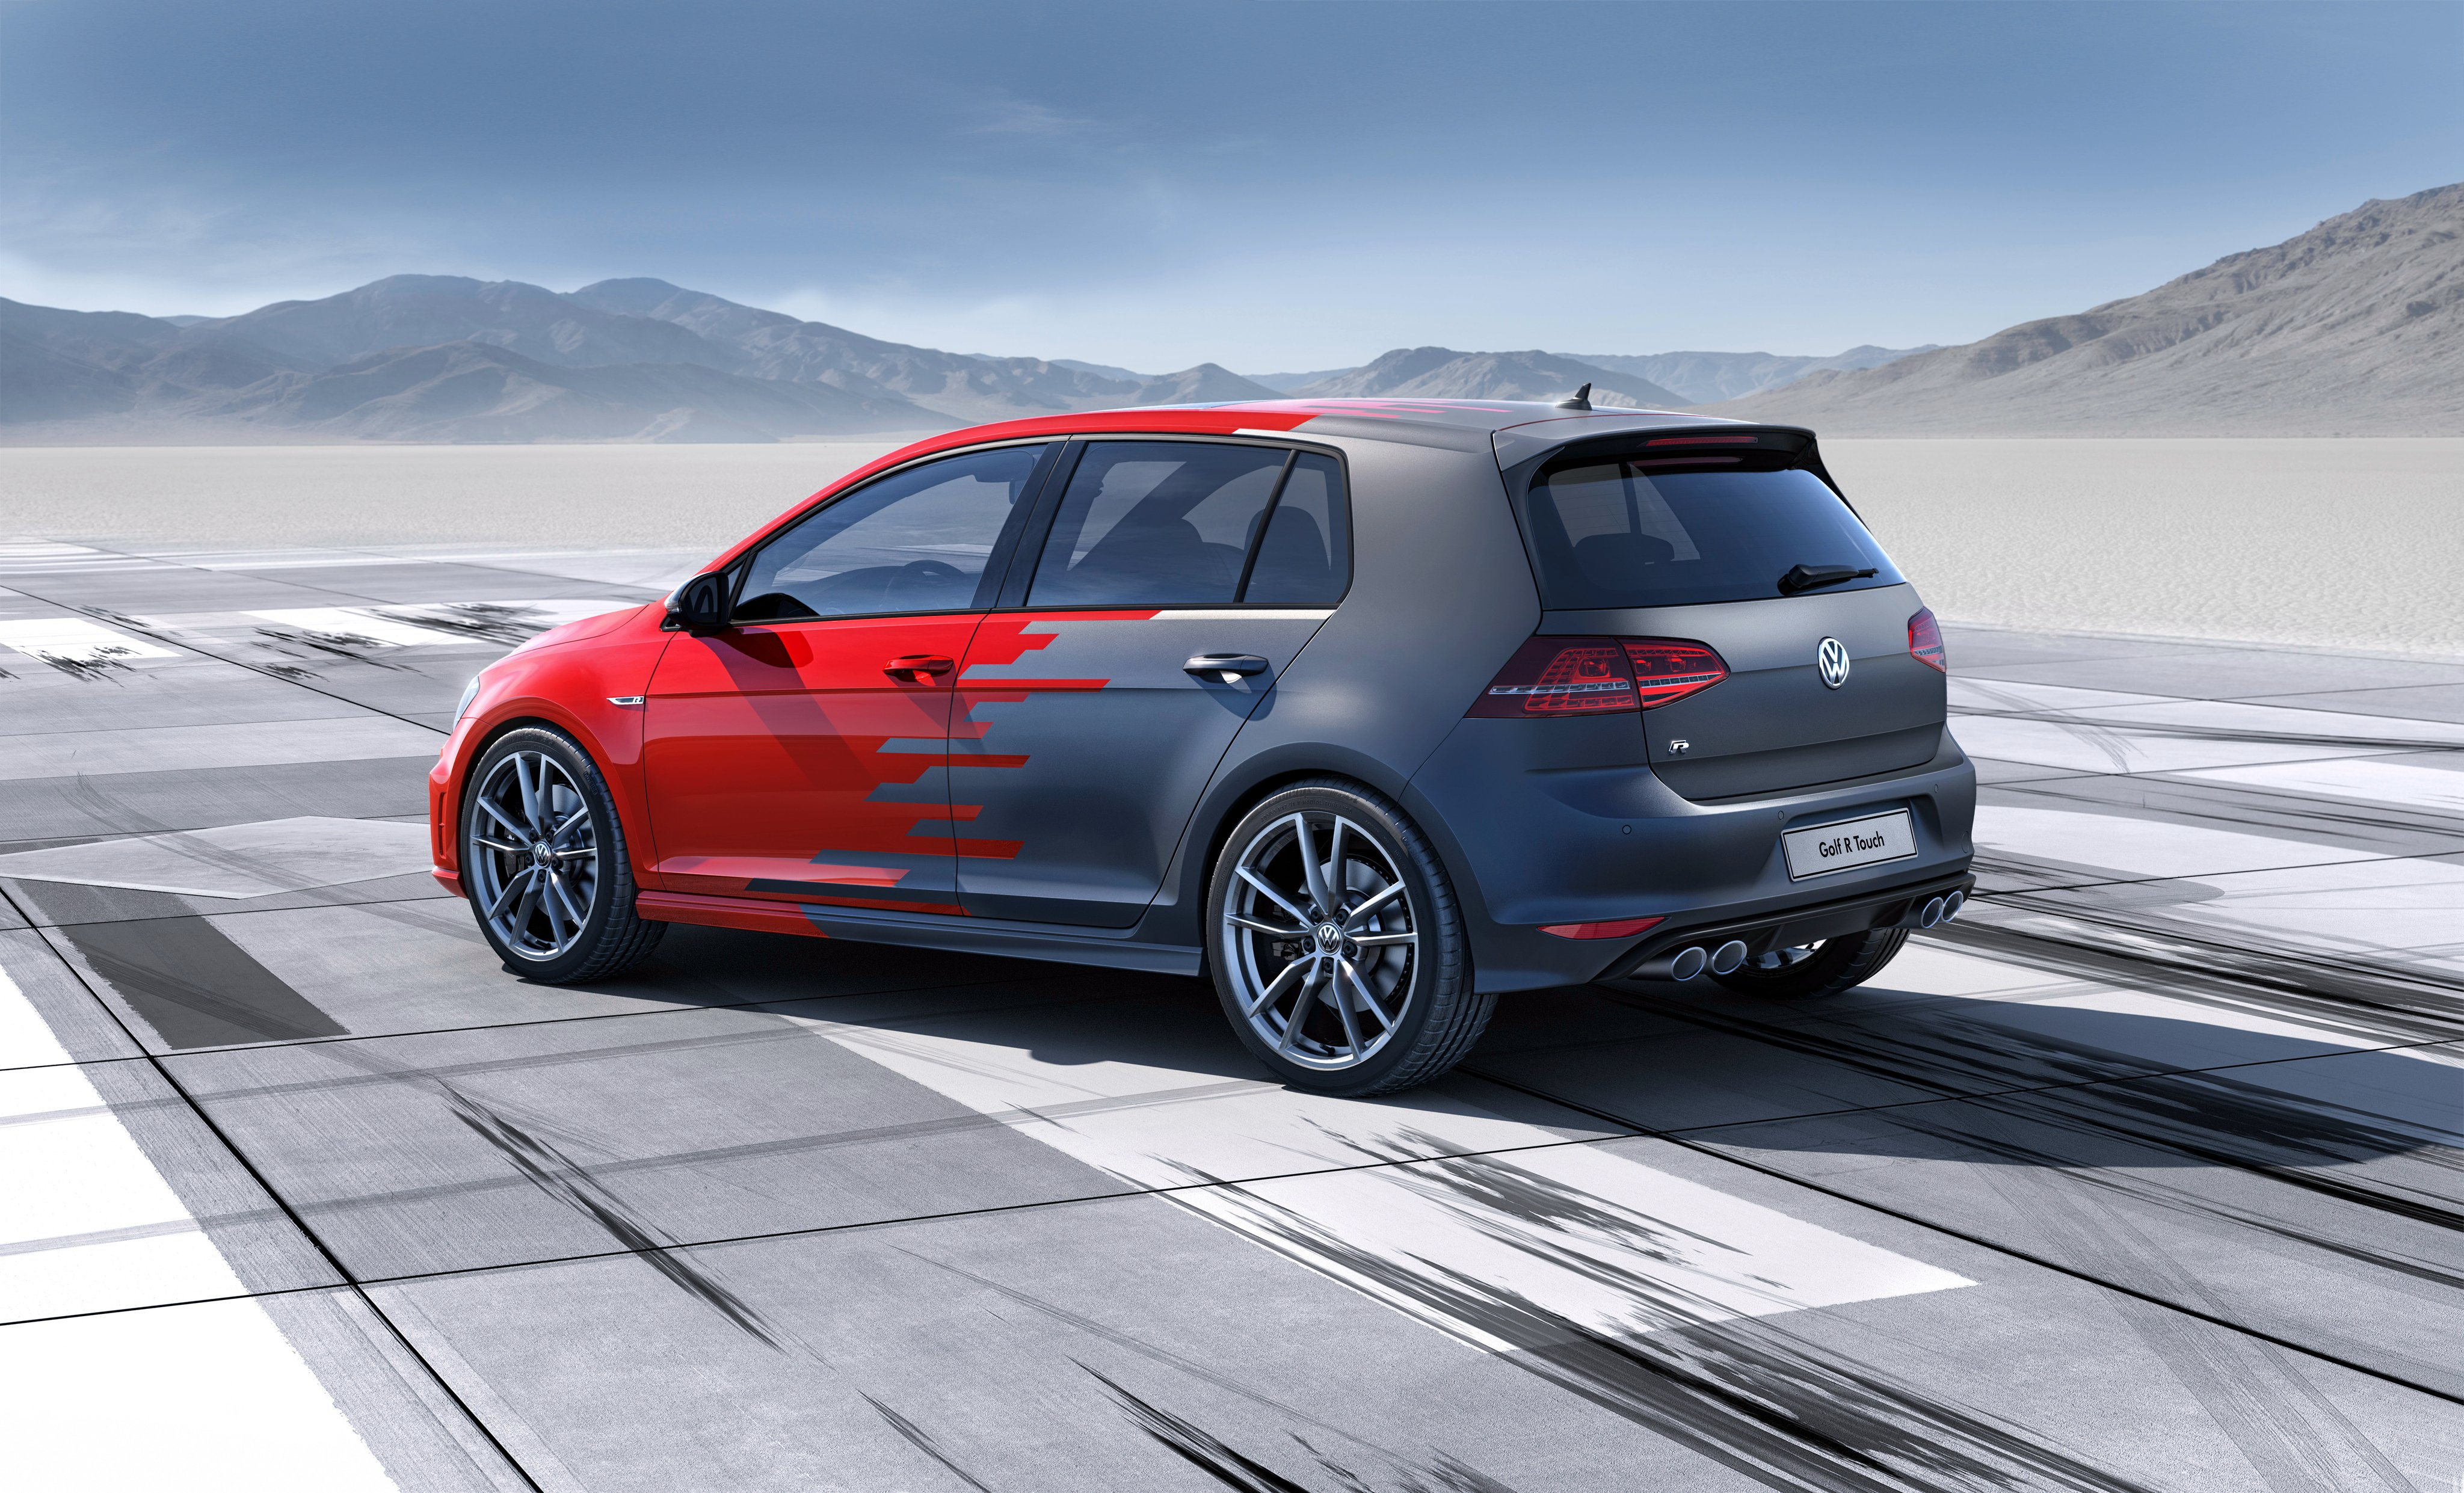 2015 Volkswagen Golf R Touch electric wallpaper | 4096x2482 | 582999 | WallpaperUP